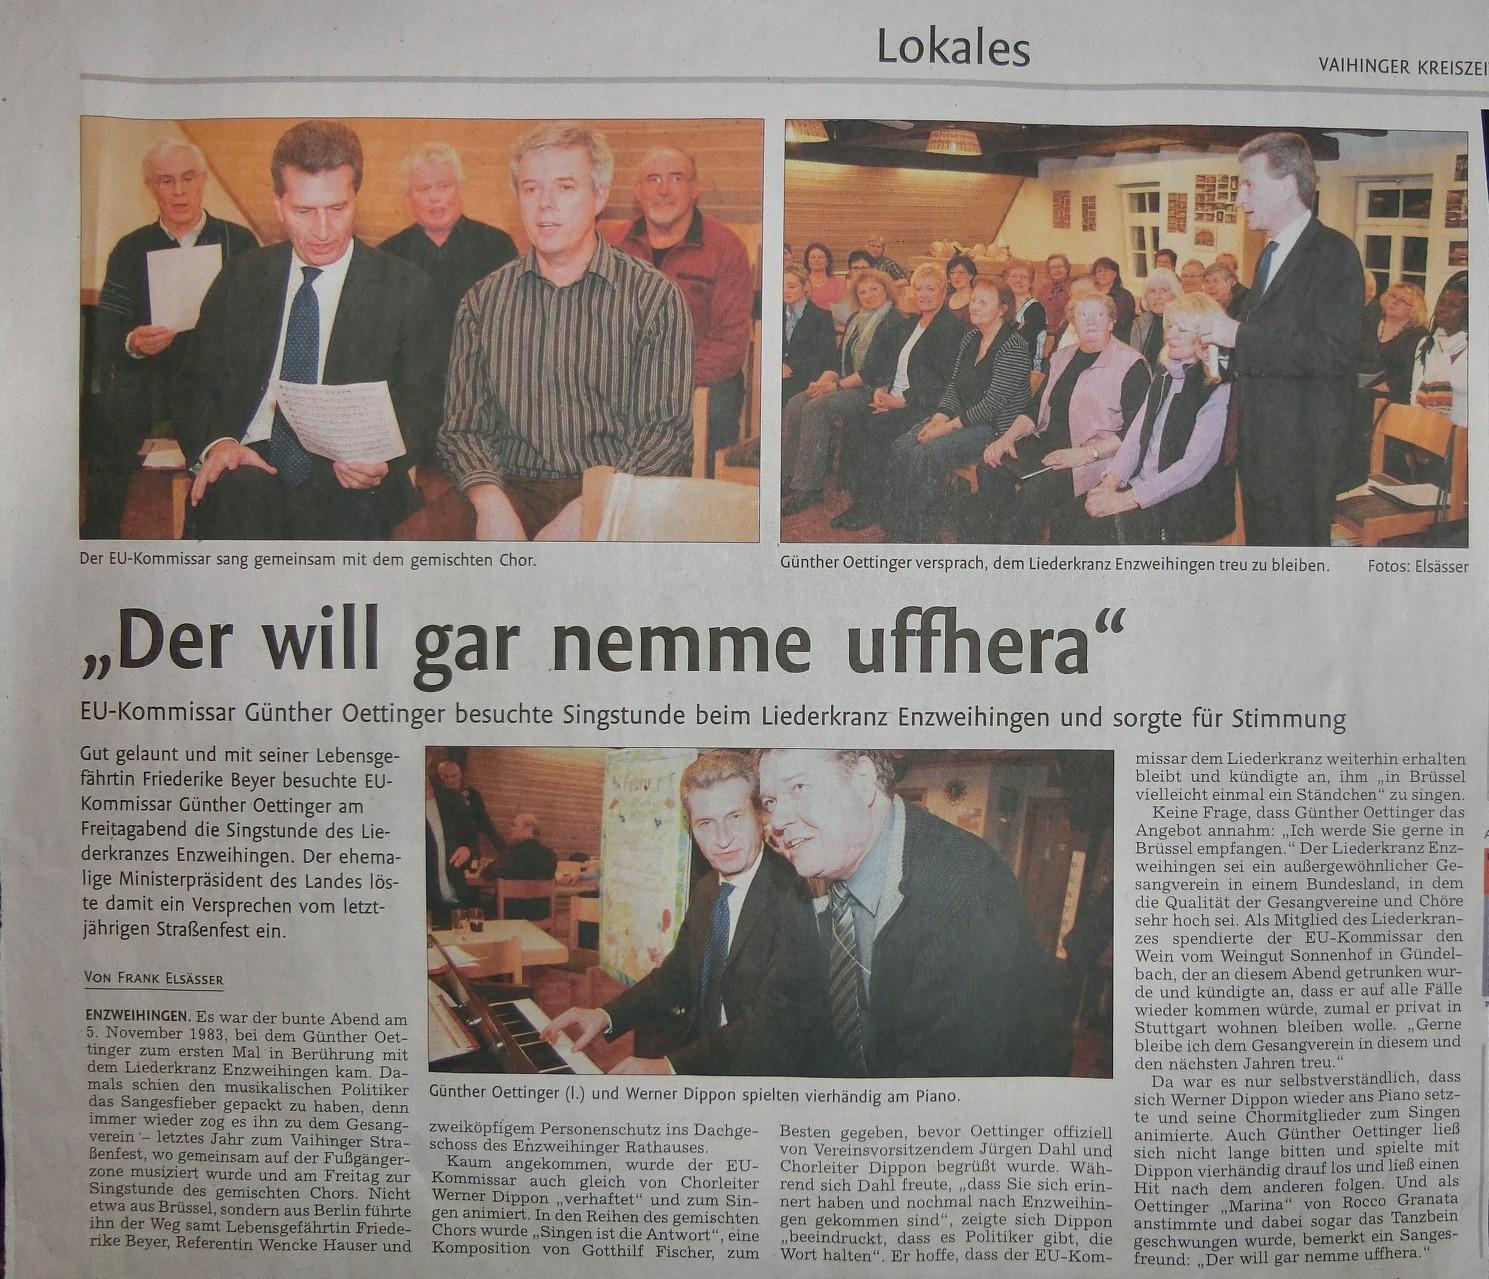 Ministerpräsident Oettinger bei Schnuppersingstunde des LKE